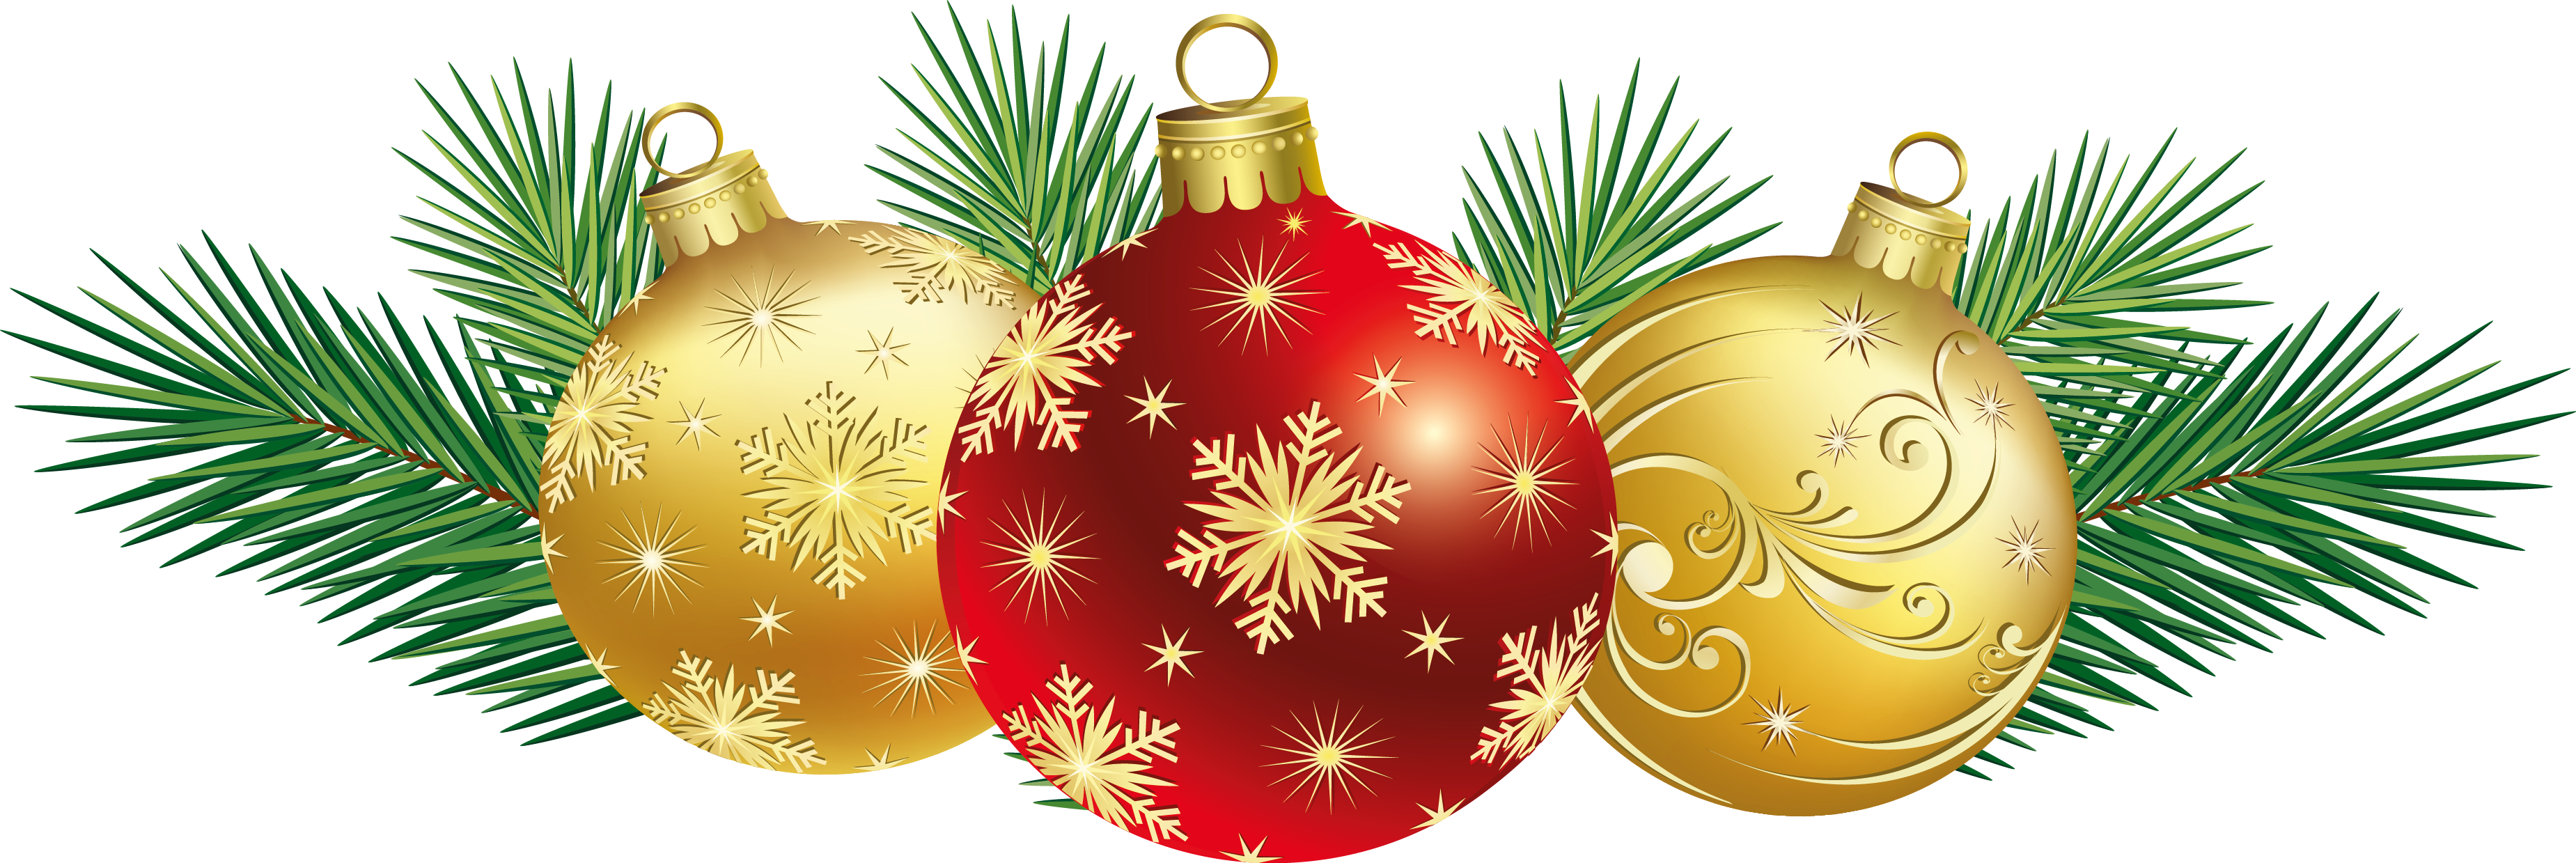 Cozy Christmas Balls . - Christmas Decoration Clipart